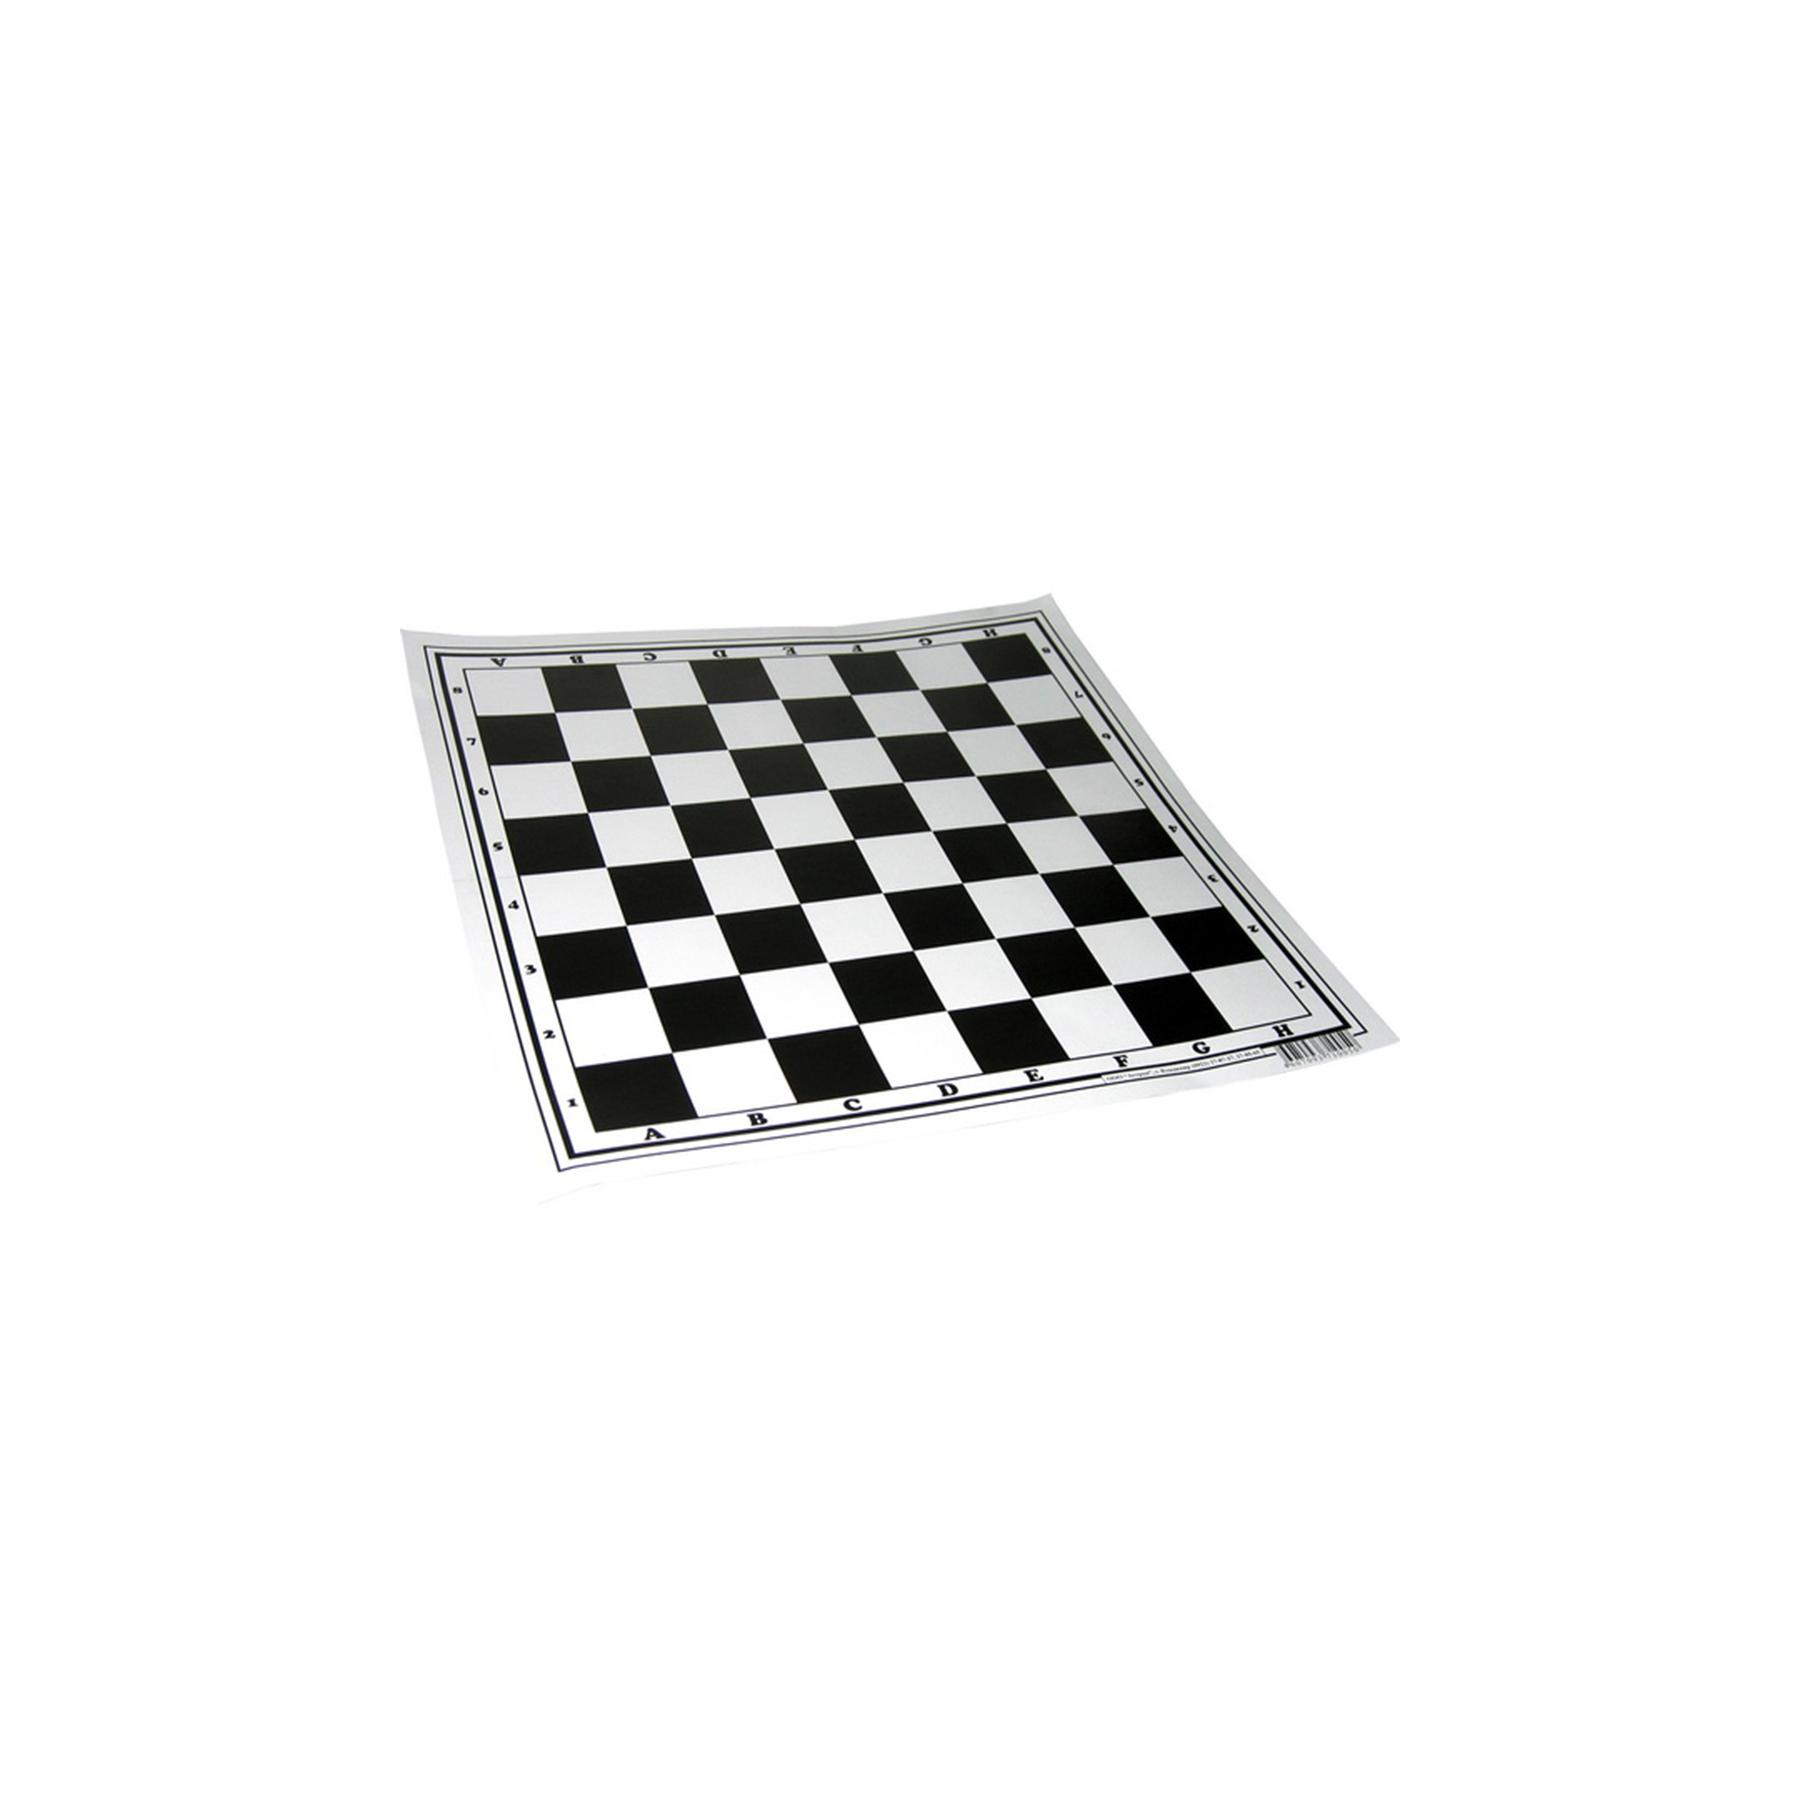 Доска шахматная Астрон (картон)